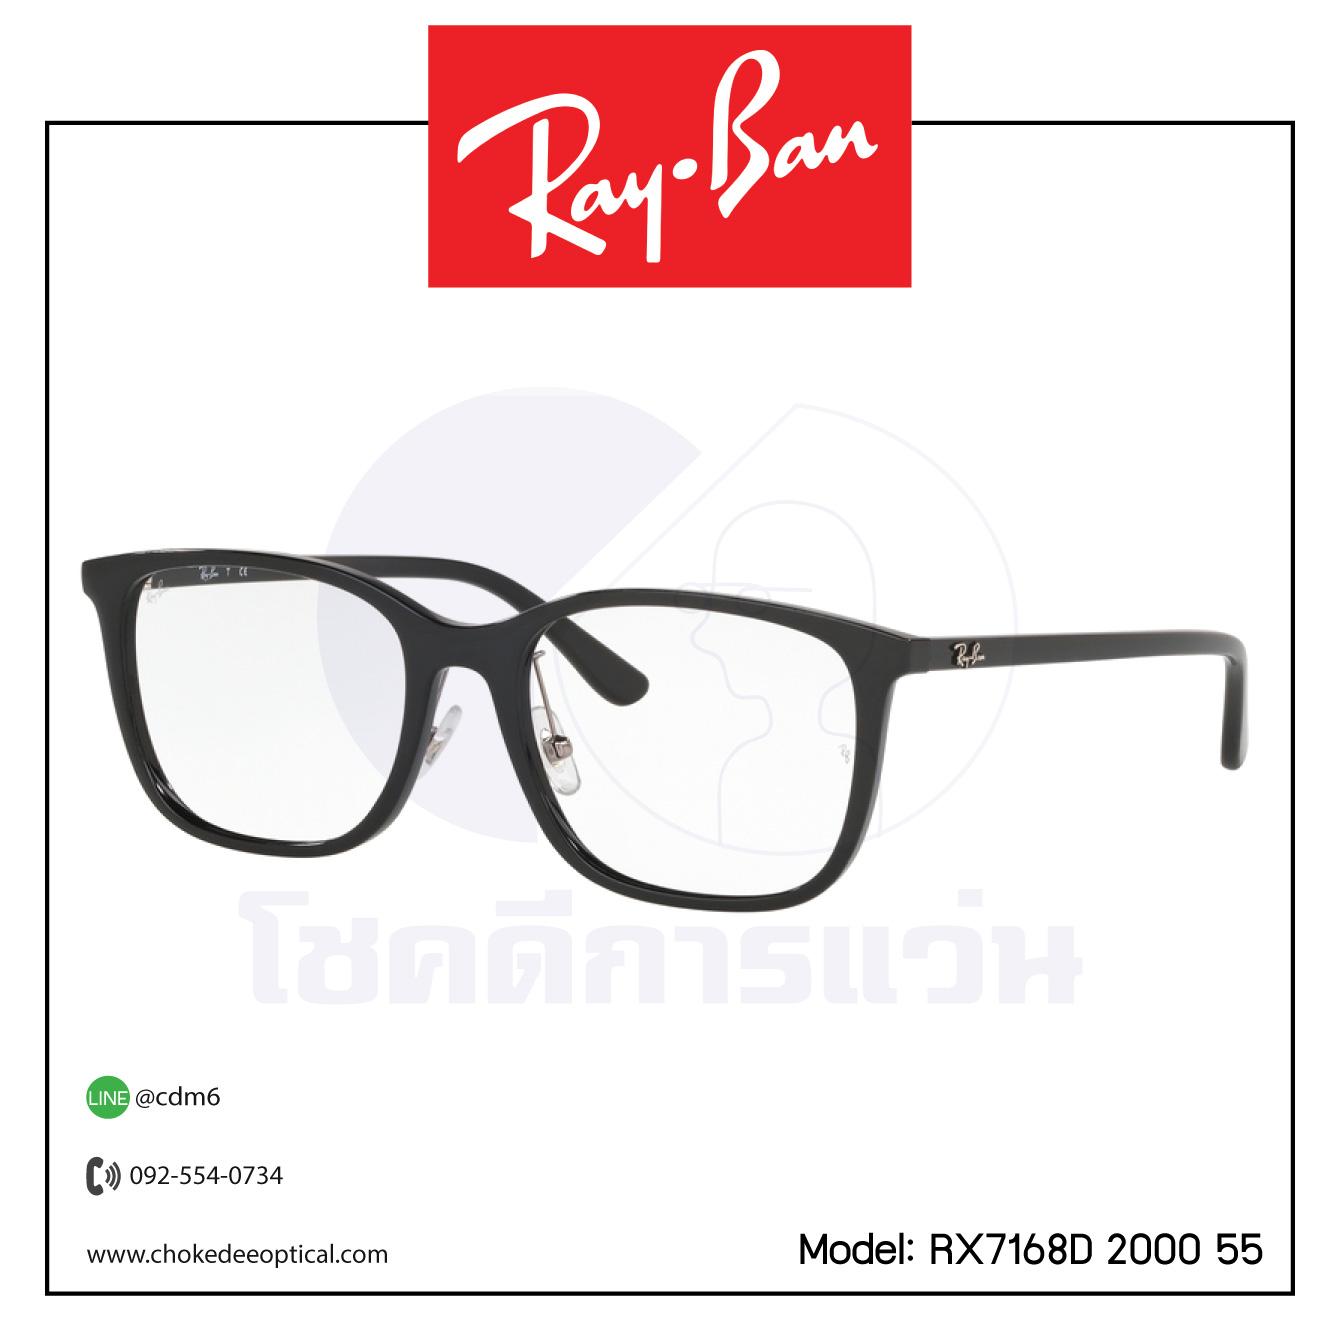 Rayban RX7168D 2000 55